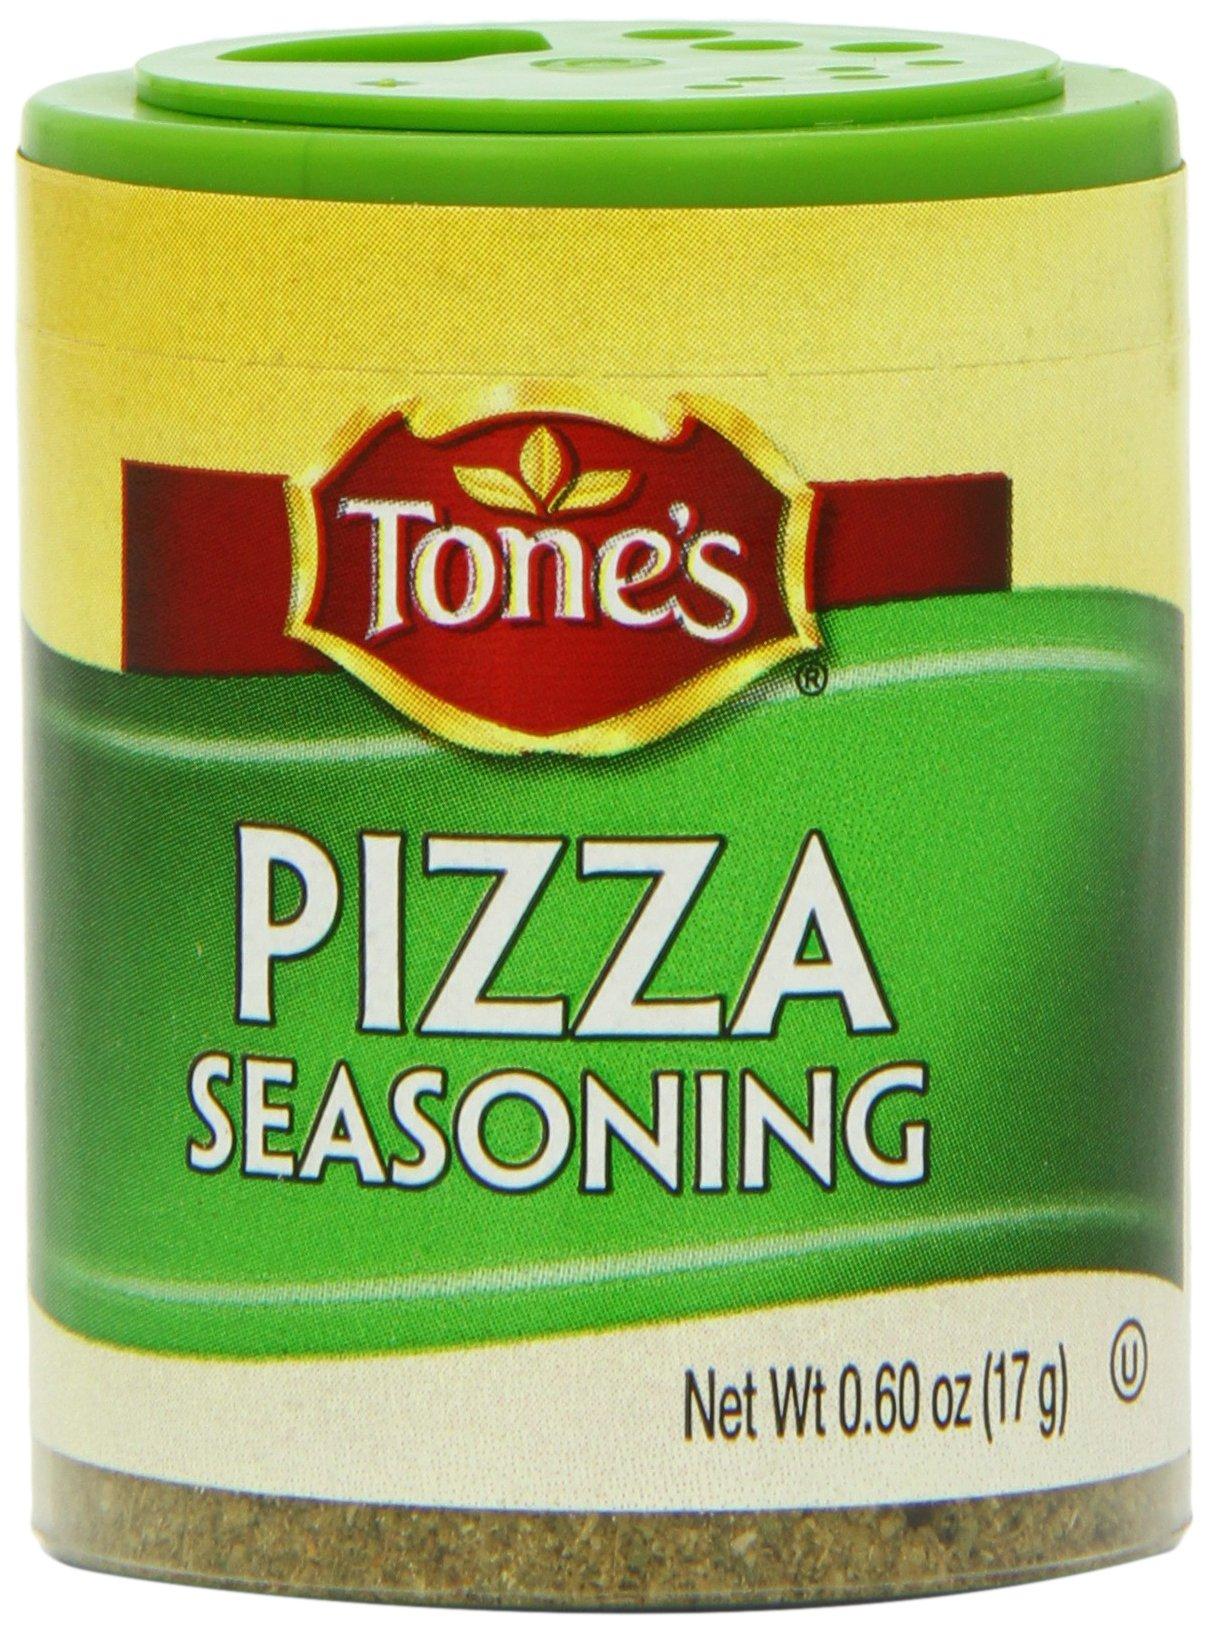 Tone's Mini's Pizza Seasoning, 0.60 Ounce (Pack of 6)